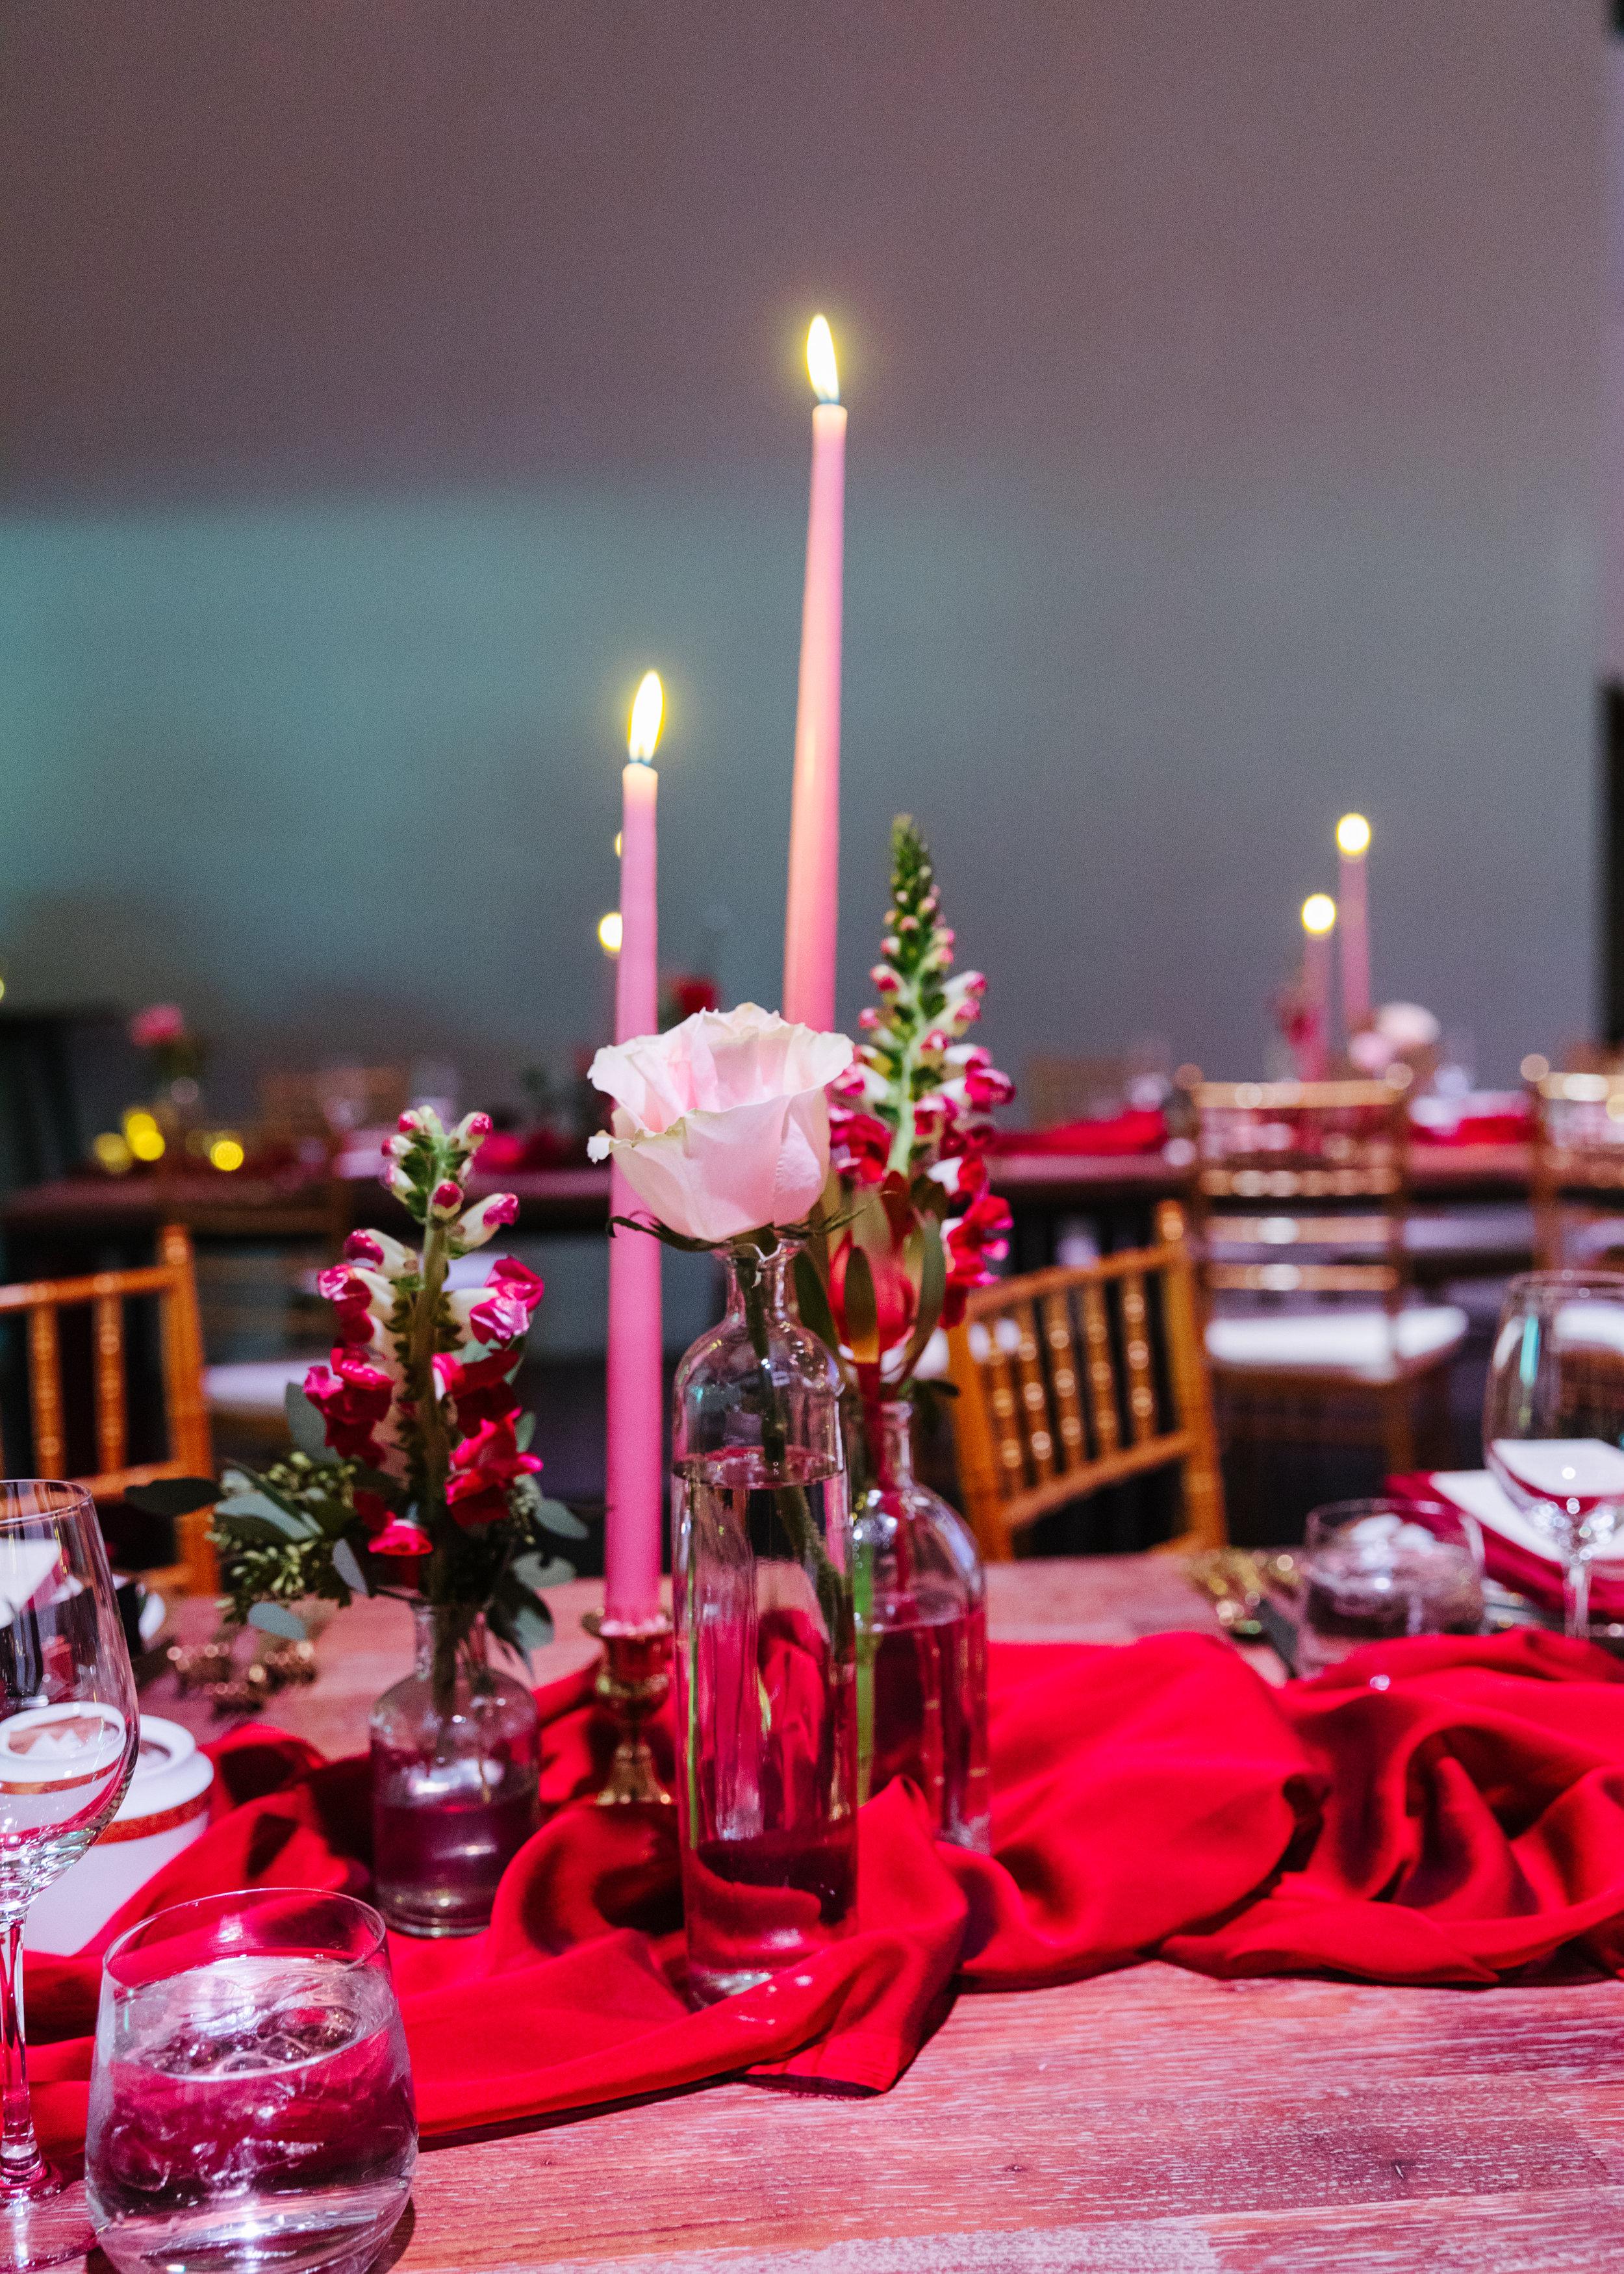 herastudios_event_bride_groom_hera_selects-2.jpg